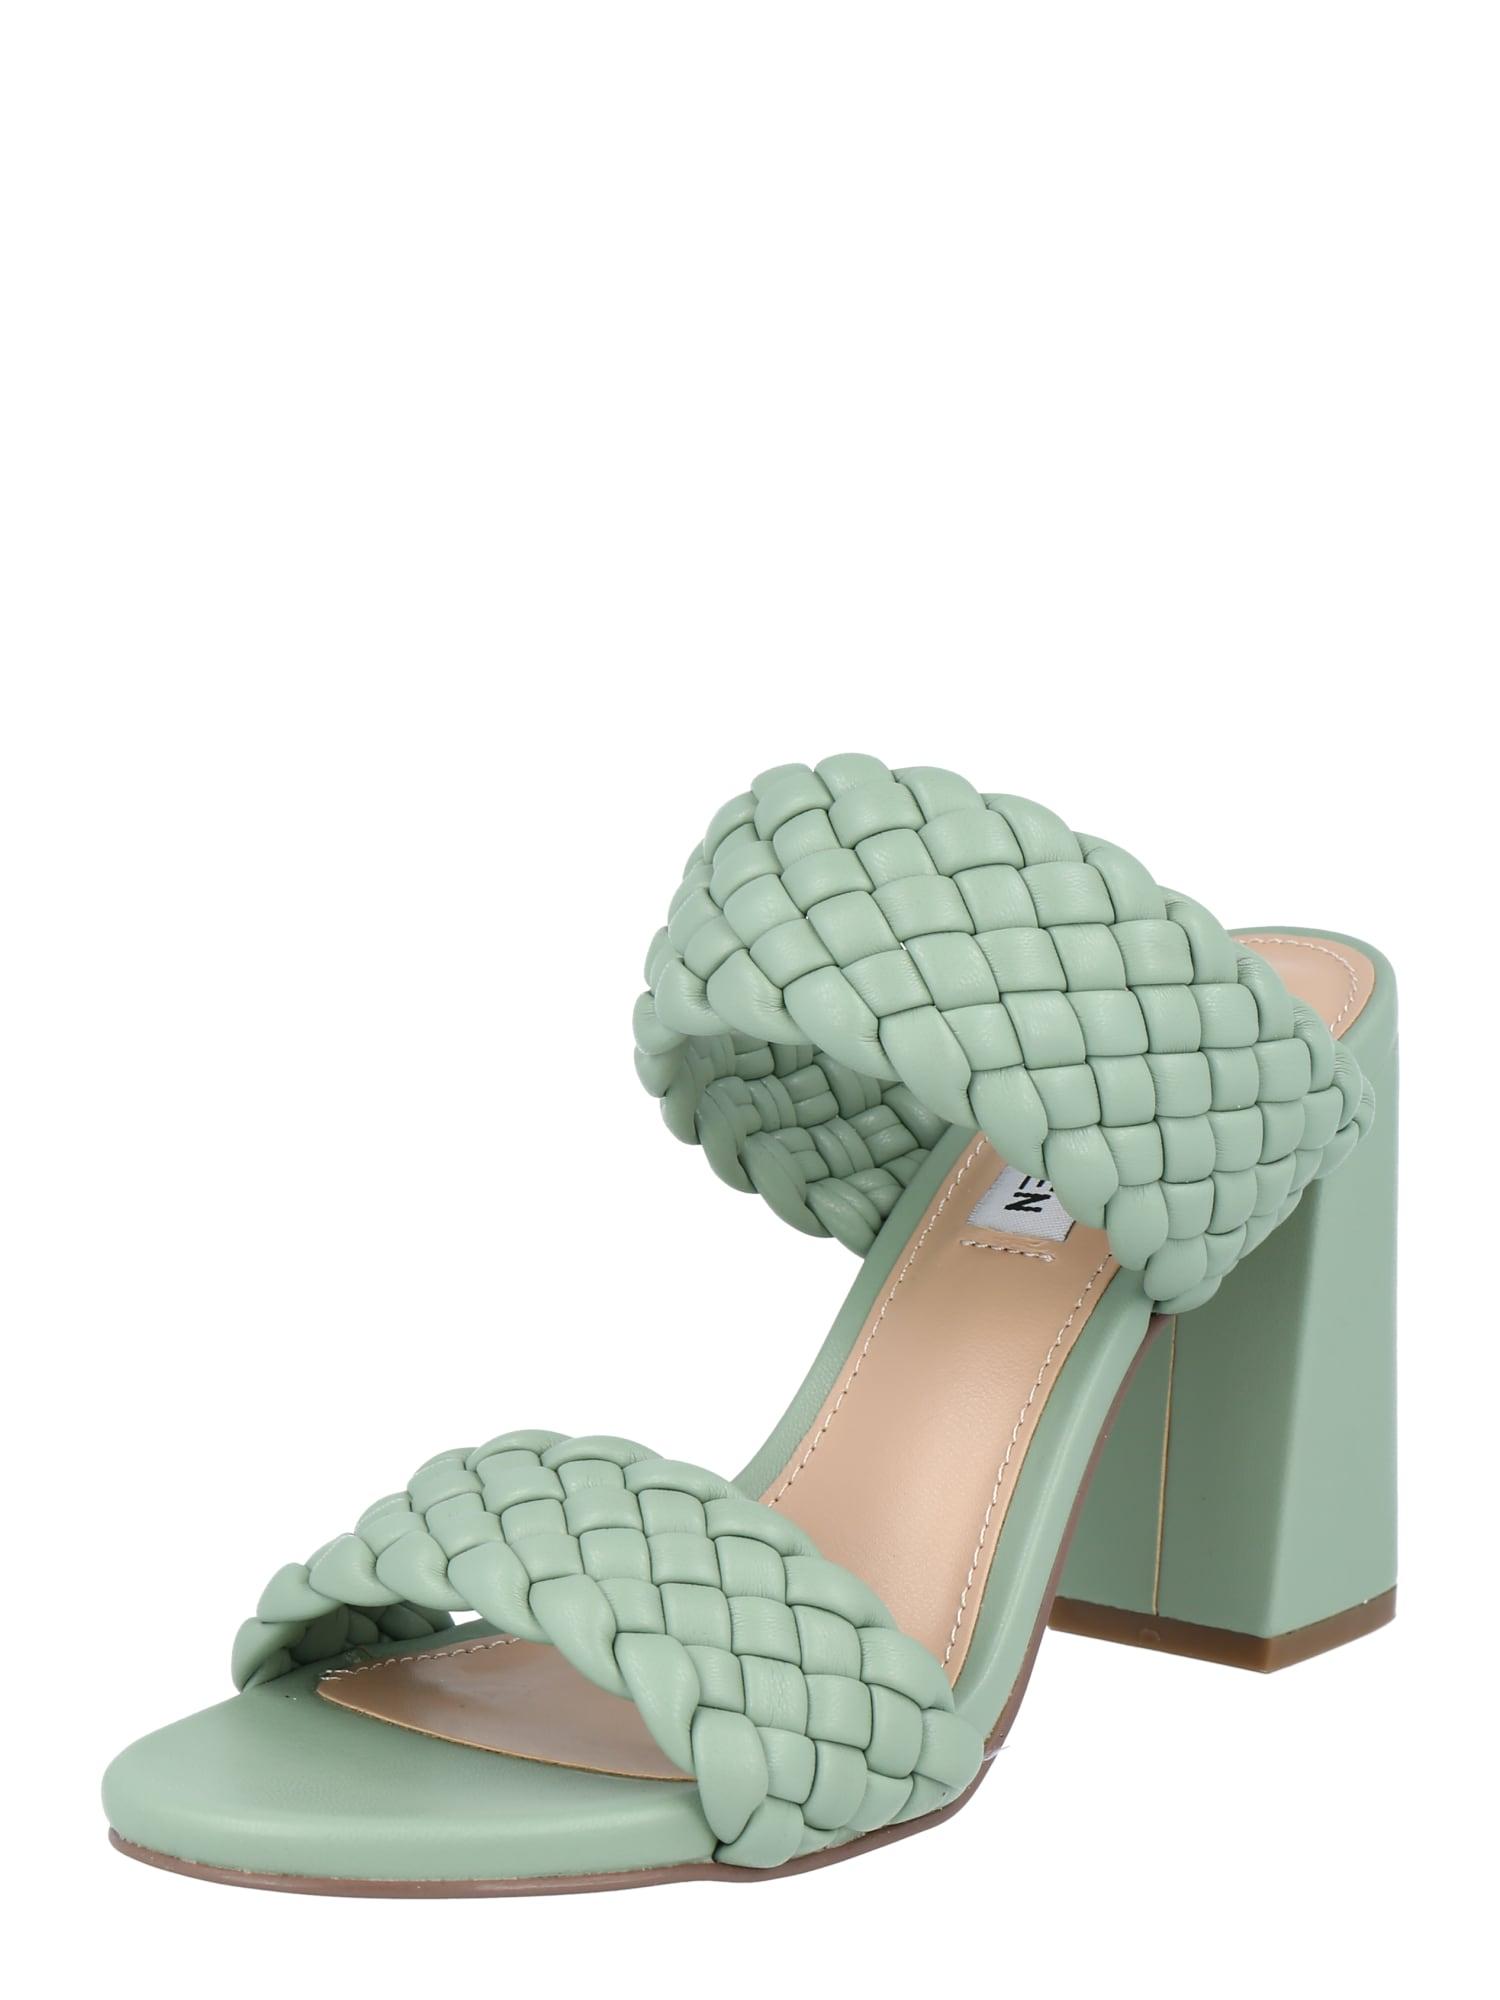 STEVE MADDEN Sandalai pastelinė žalia